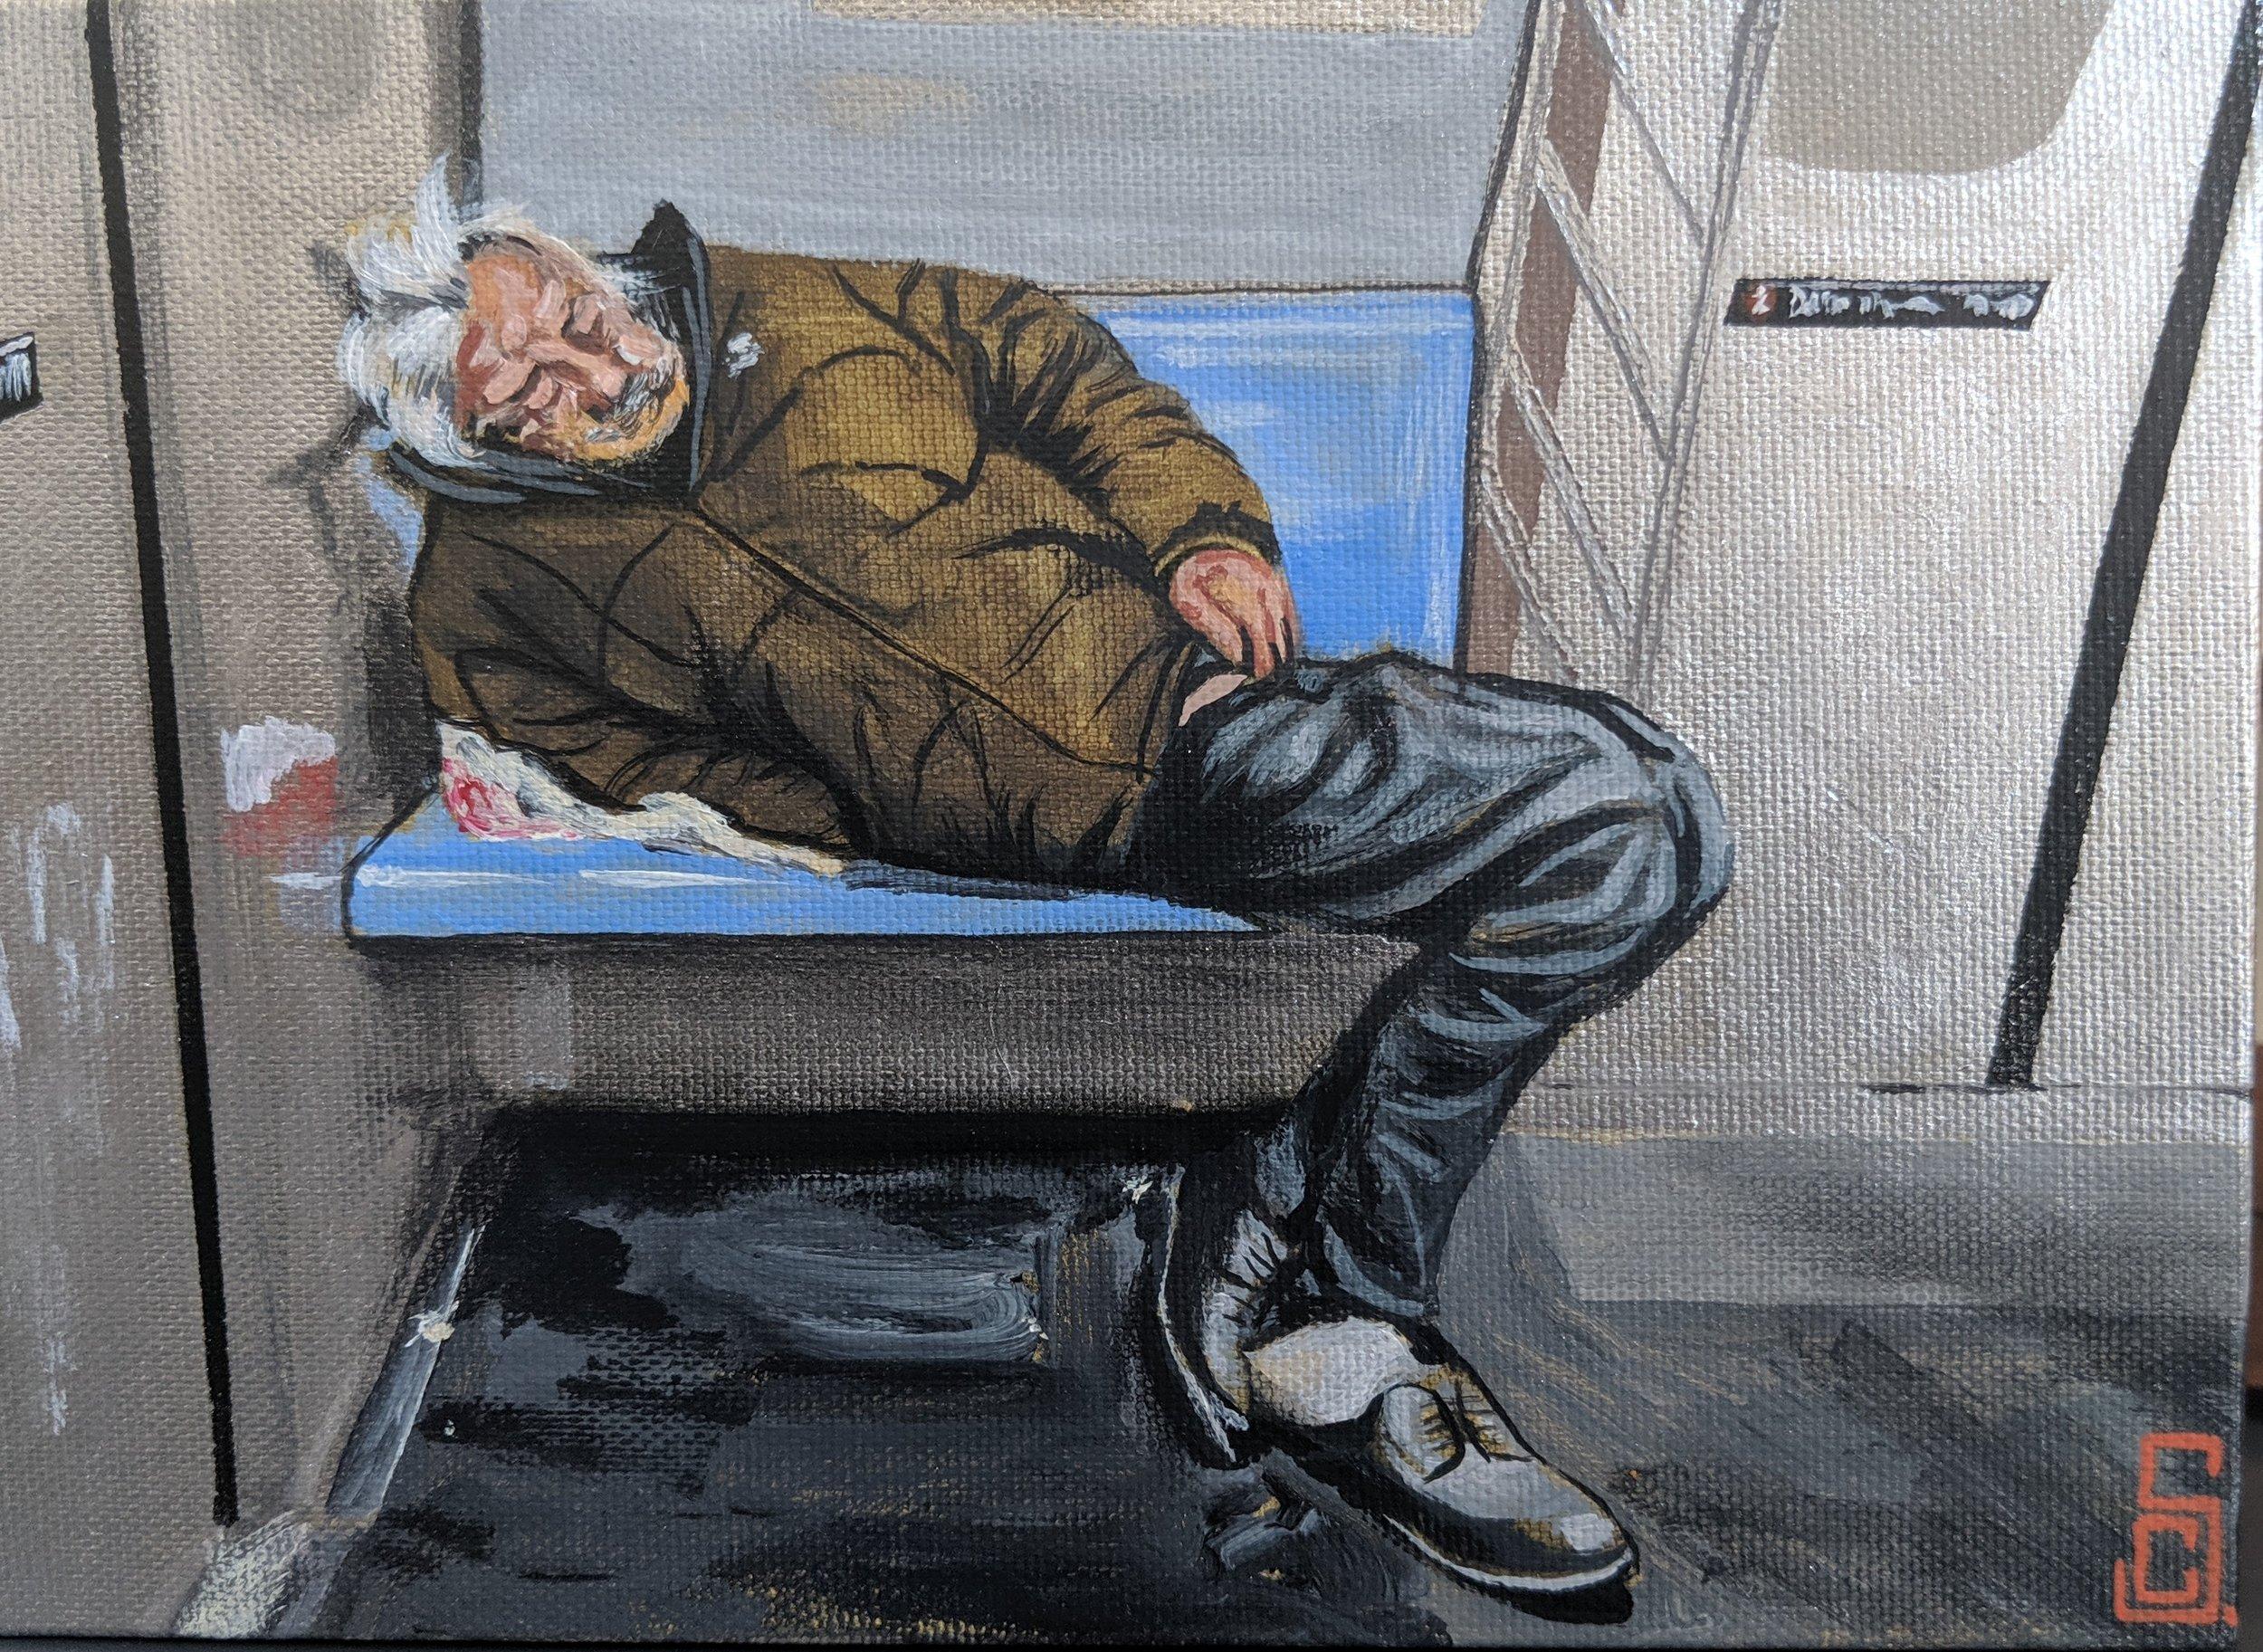 """Homeless man inside the subway"" 5"" x 7"" Acrylic on canvas"